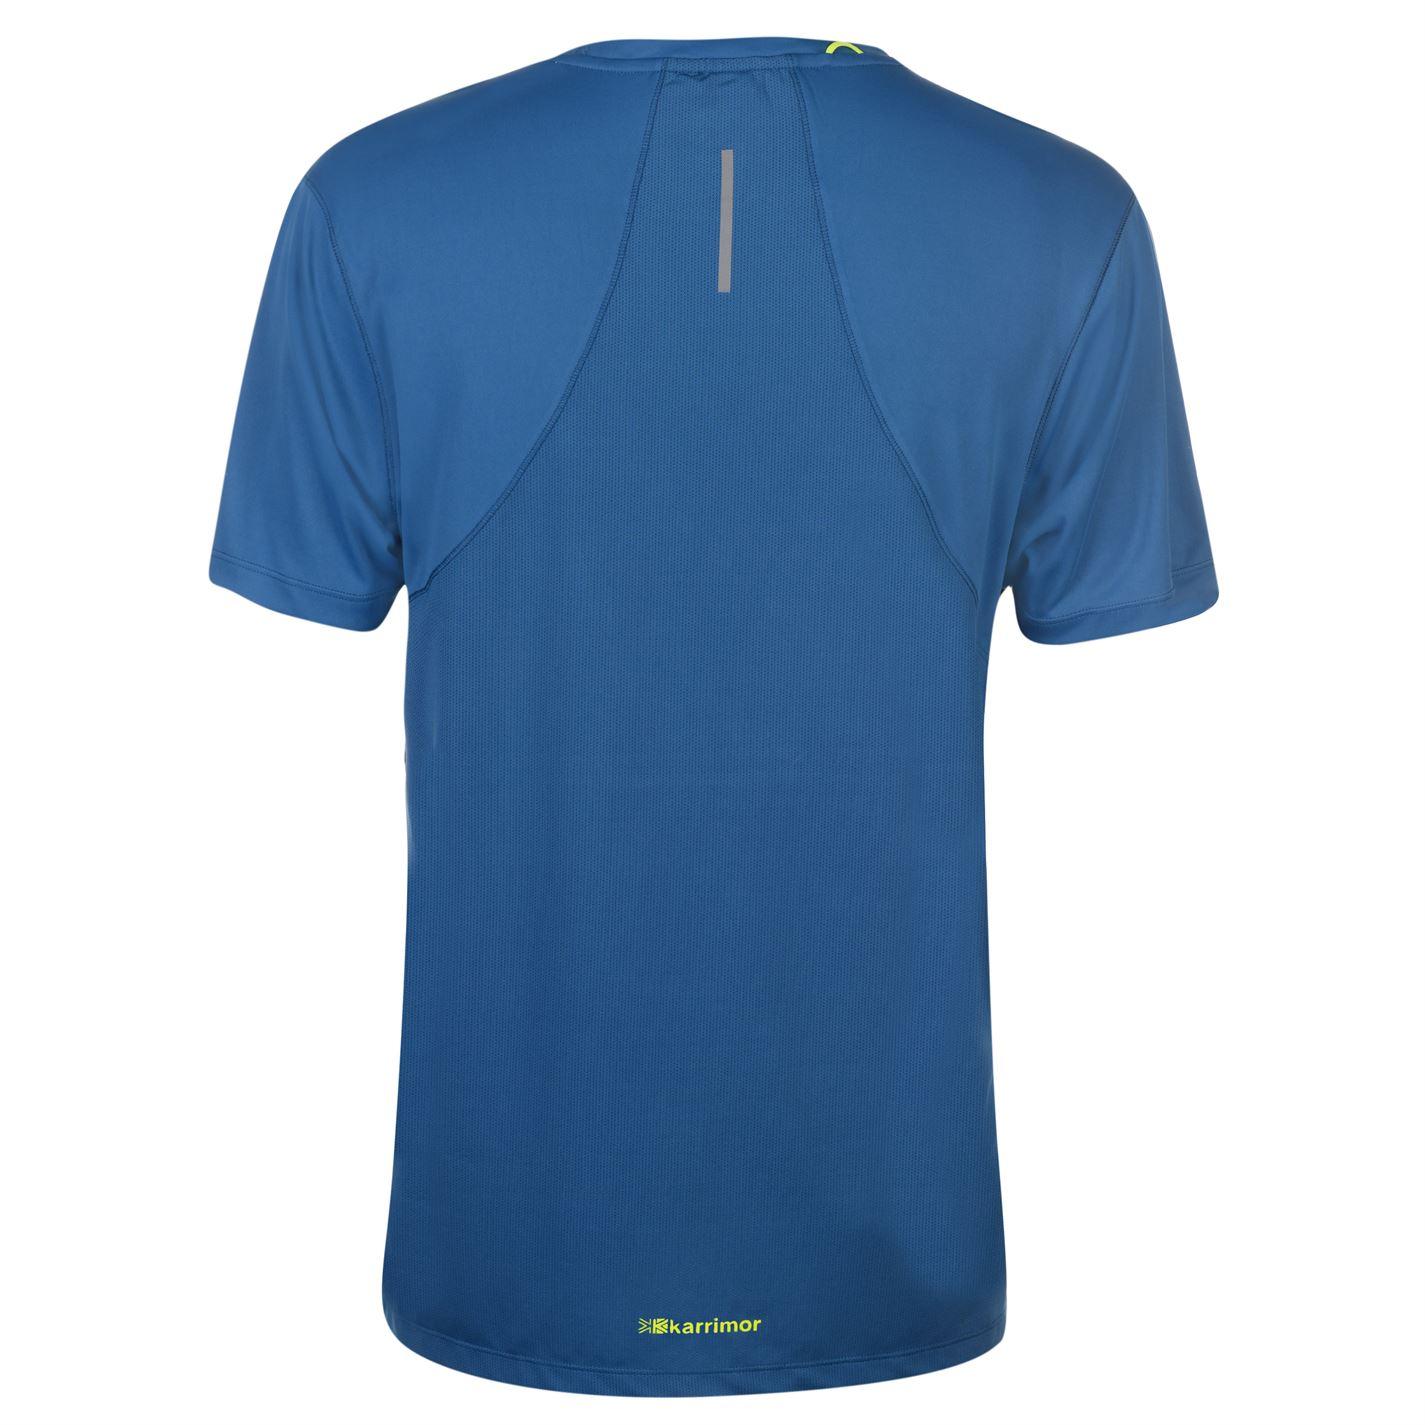 Karrimor-Hombres-X-Lite-Camiseta-mangas-cortas-de-carrera-Rendimiento-Camiseta-Top-Cuello-Redondo miniatura 19